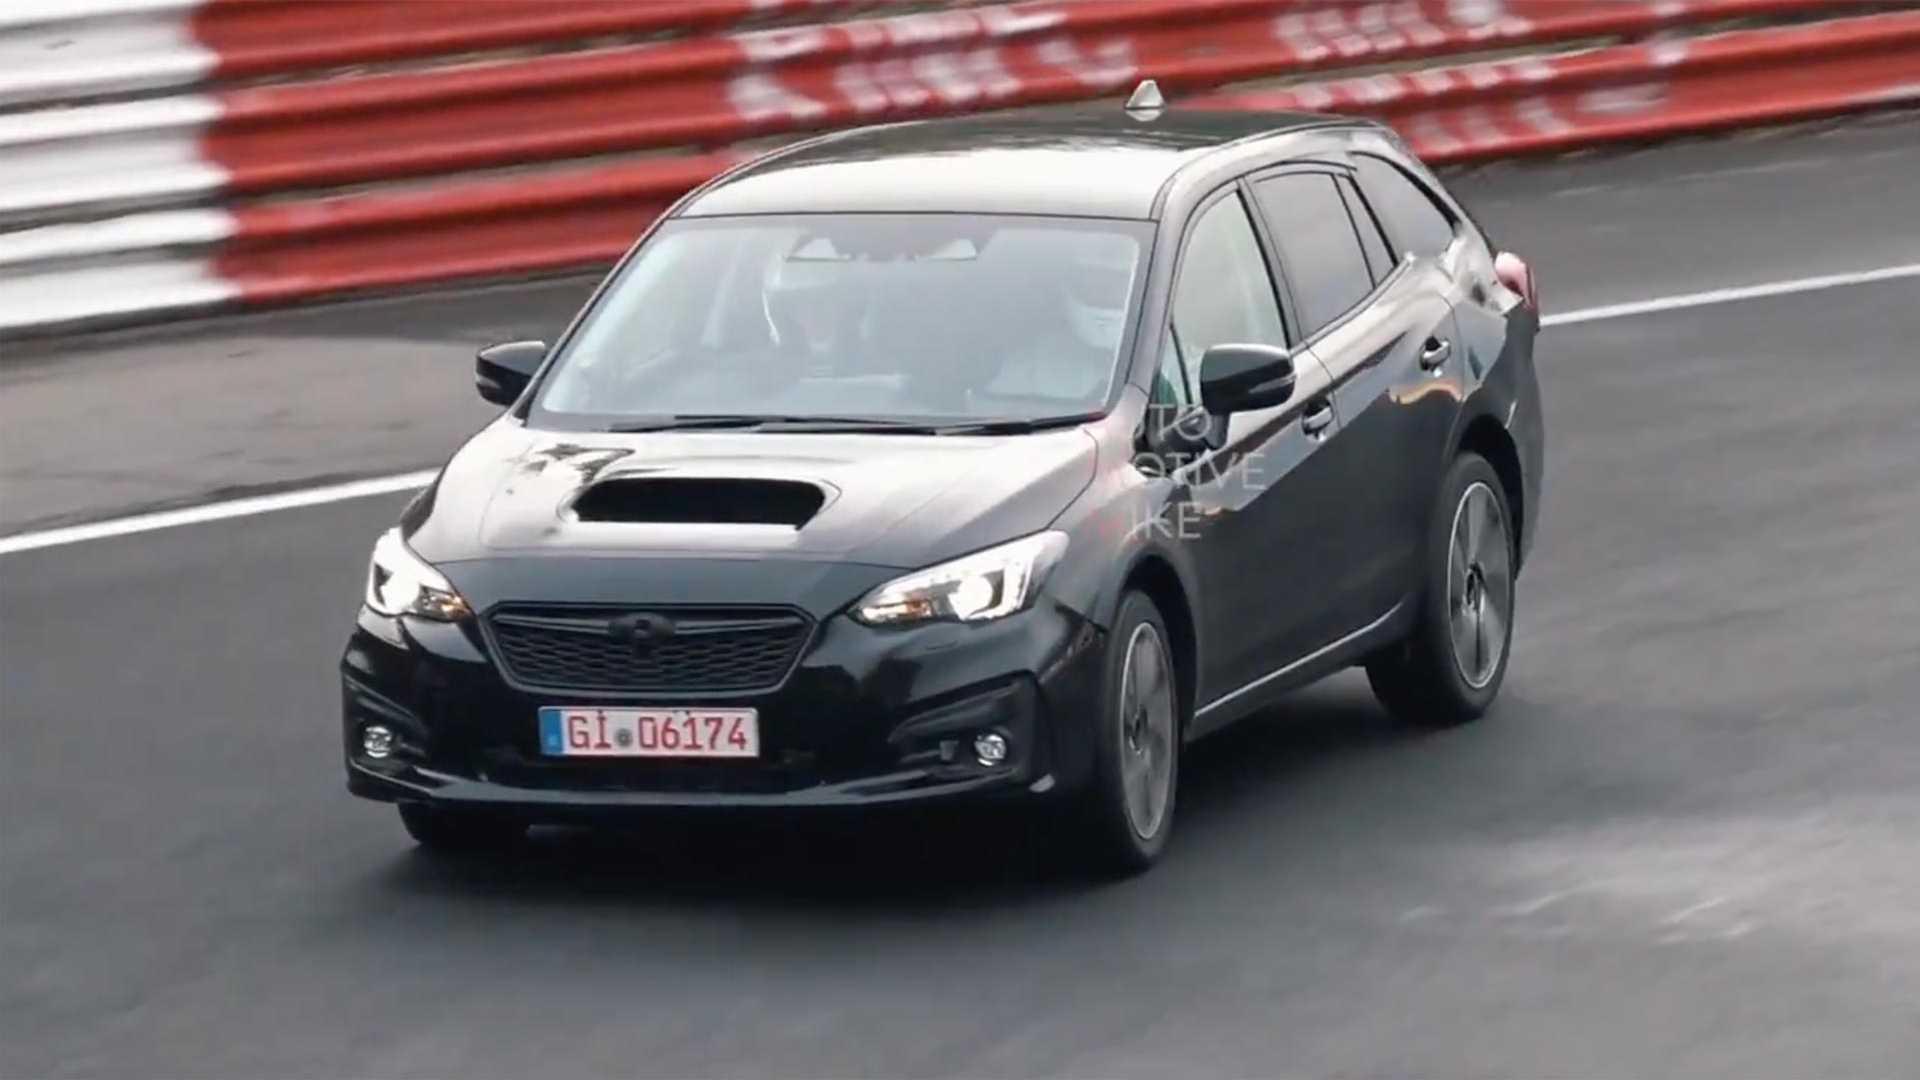 40 New Subaru Levorg 2020 Reviews by Subaru Levorg 2020